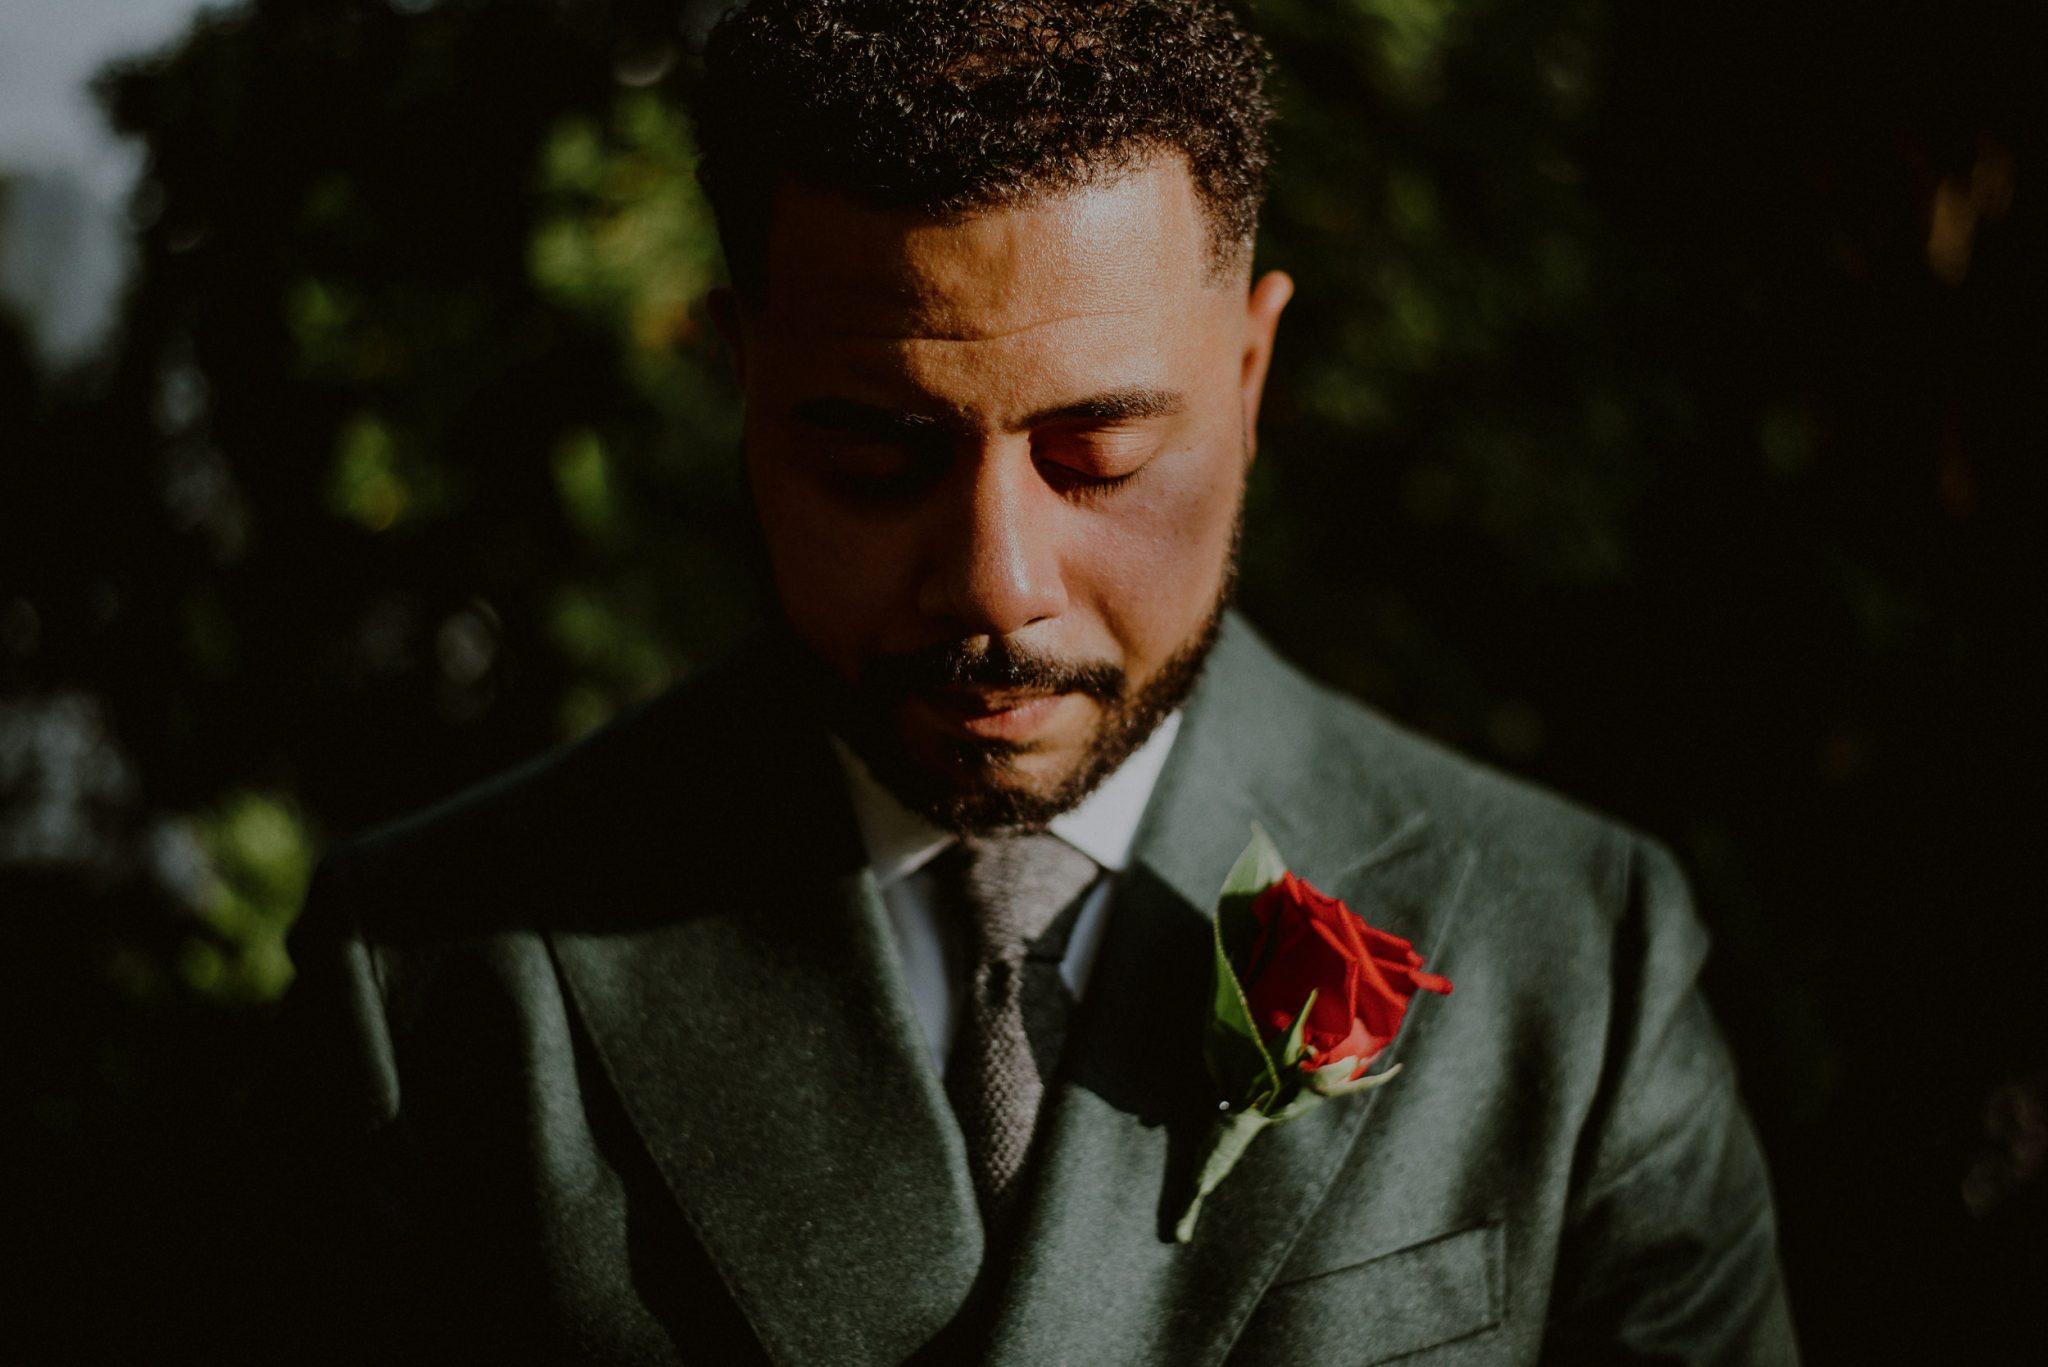 creative groom portrait in sunlight wearing green suit